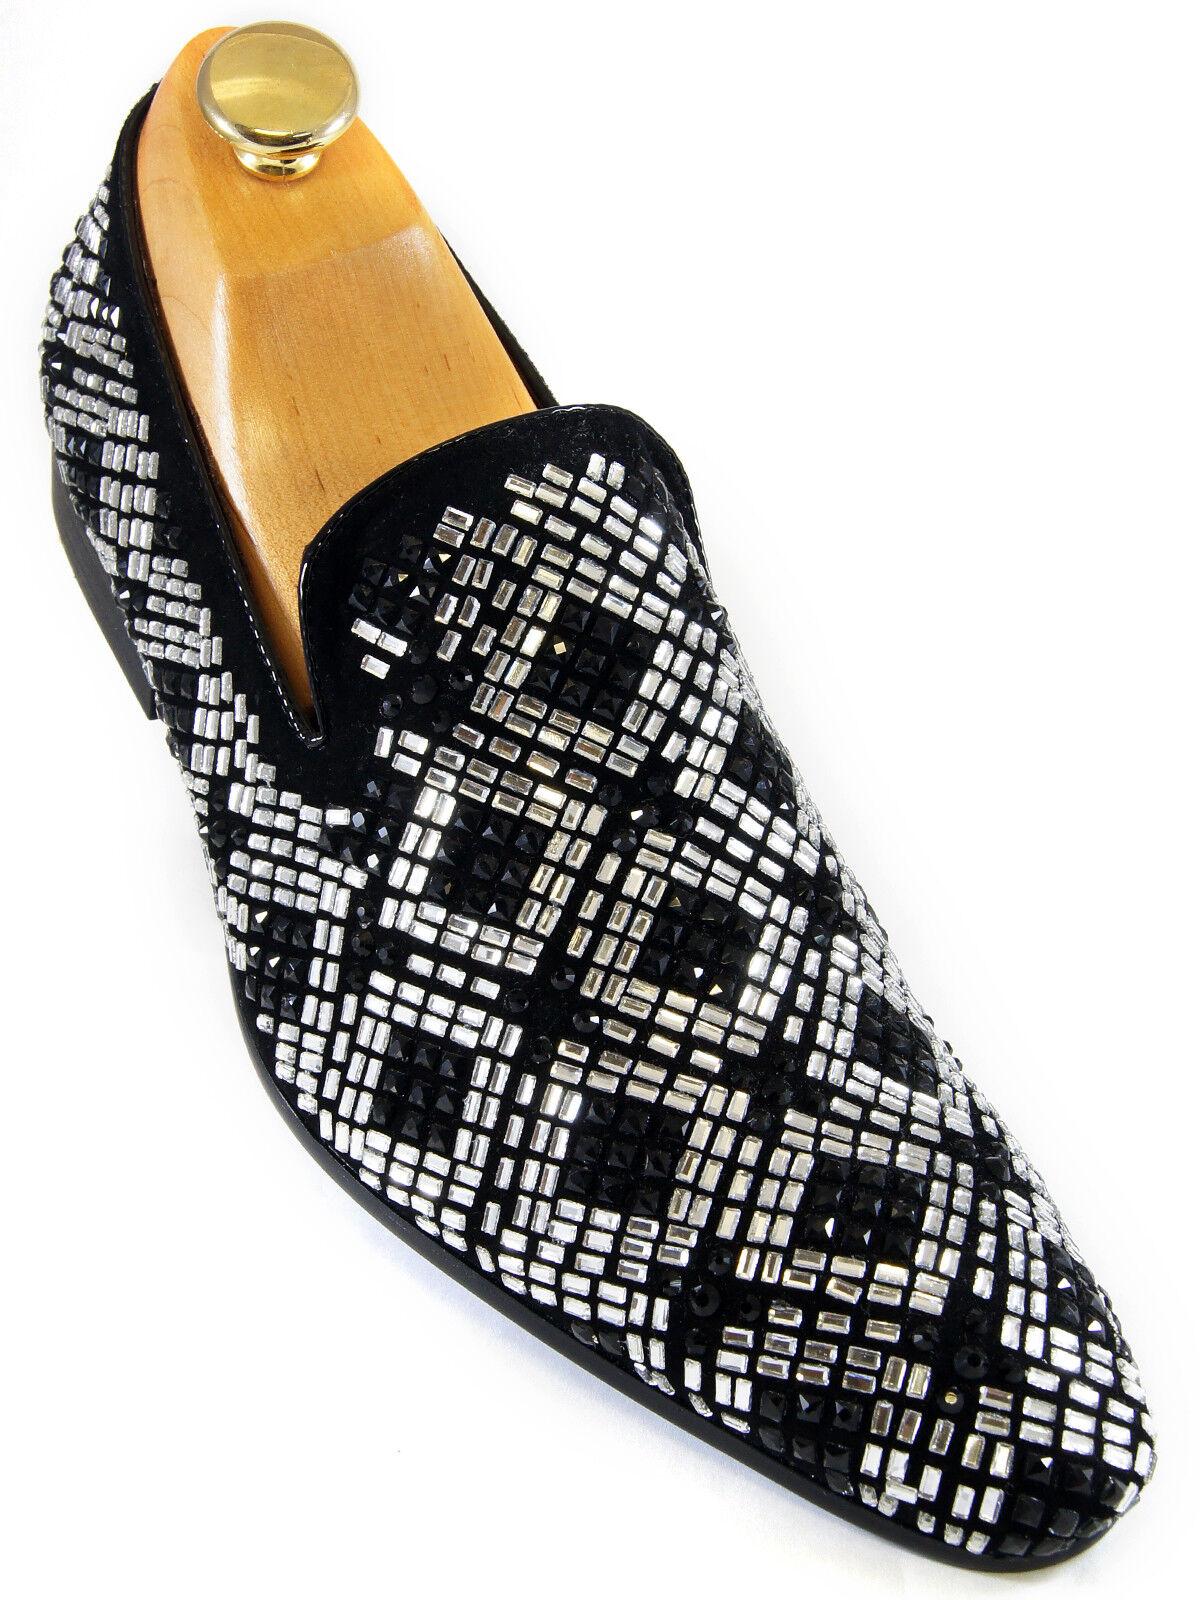 Zota Gamuza Para Hombre Negro Plata Rhinestone diseño animador Slipon Fiesta Diversión Zapato